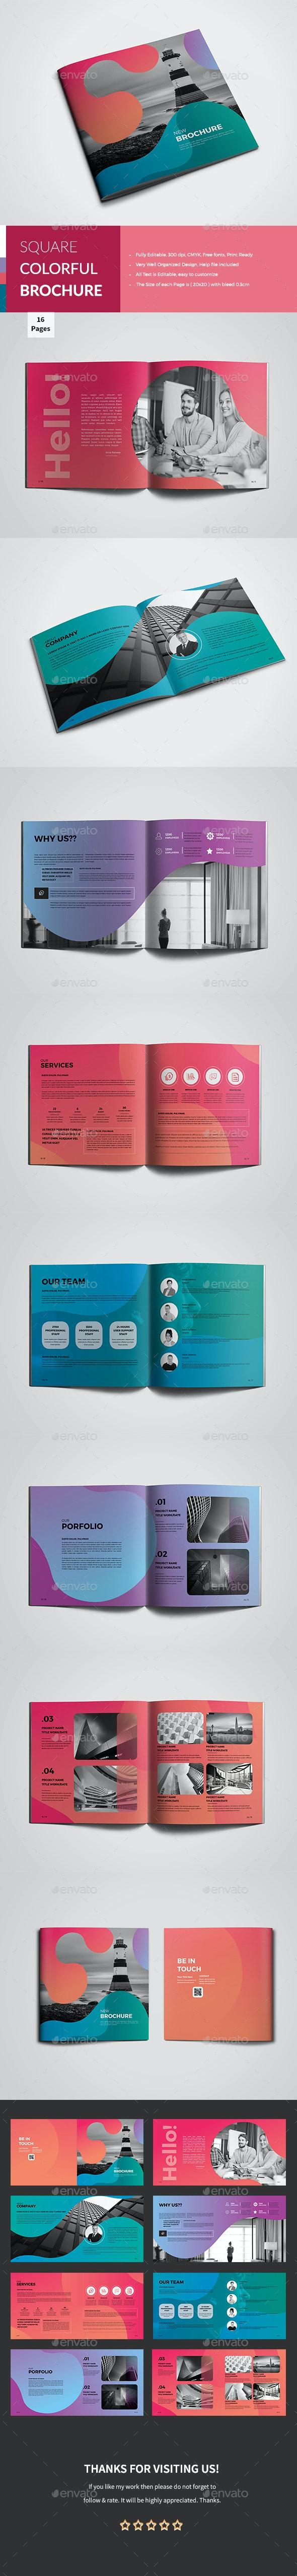 Square Colorful Corporate Brochure - Corporate Brochures